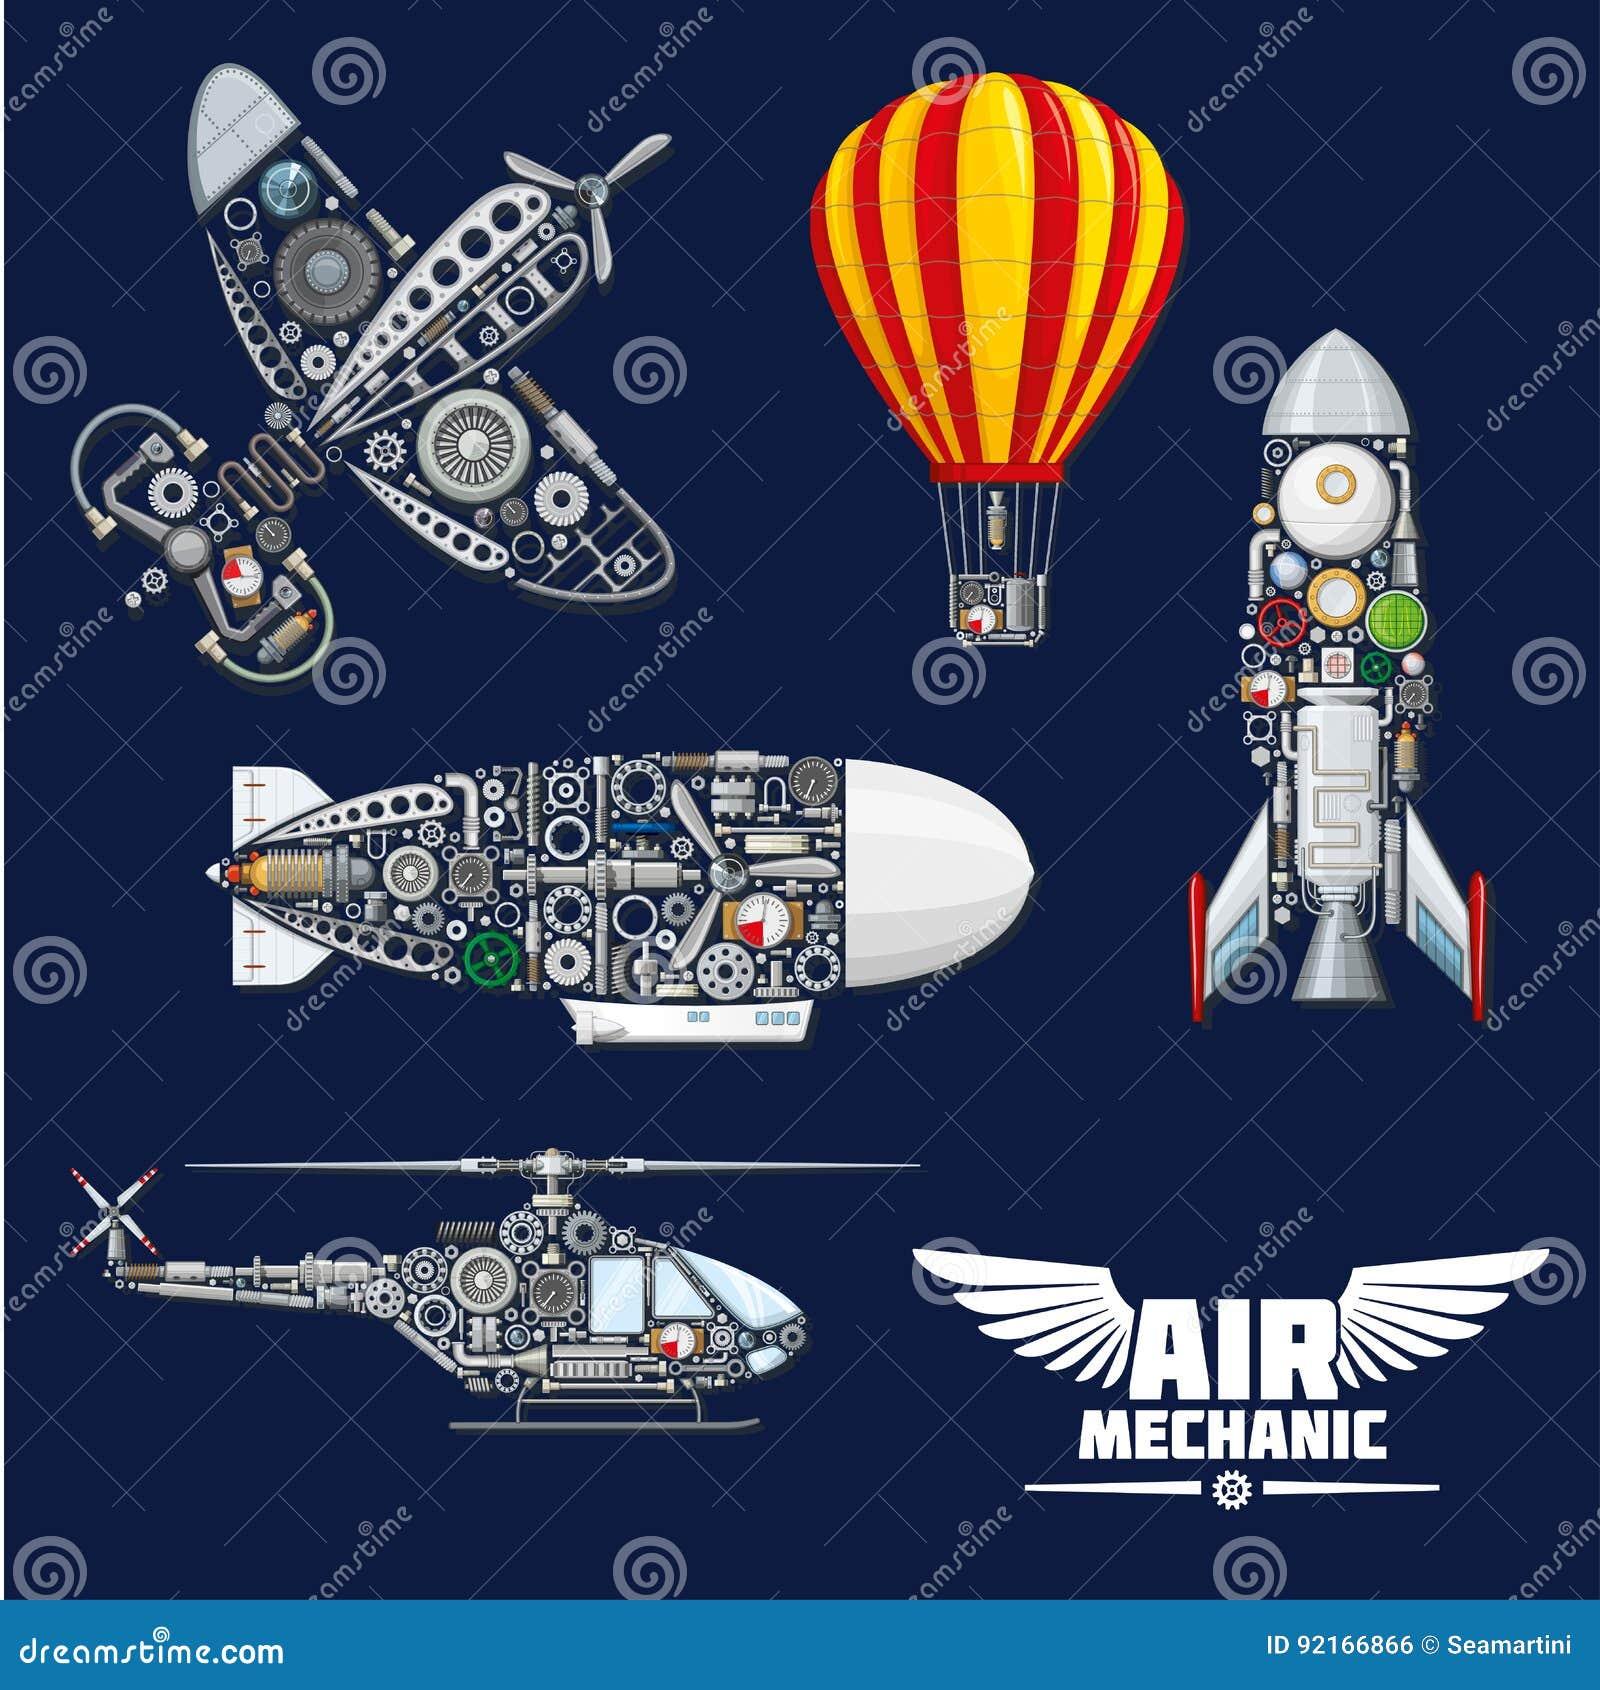 Air mechanics and mechanisms vector icons set